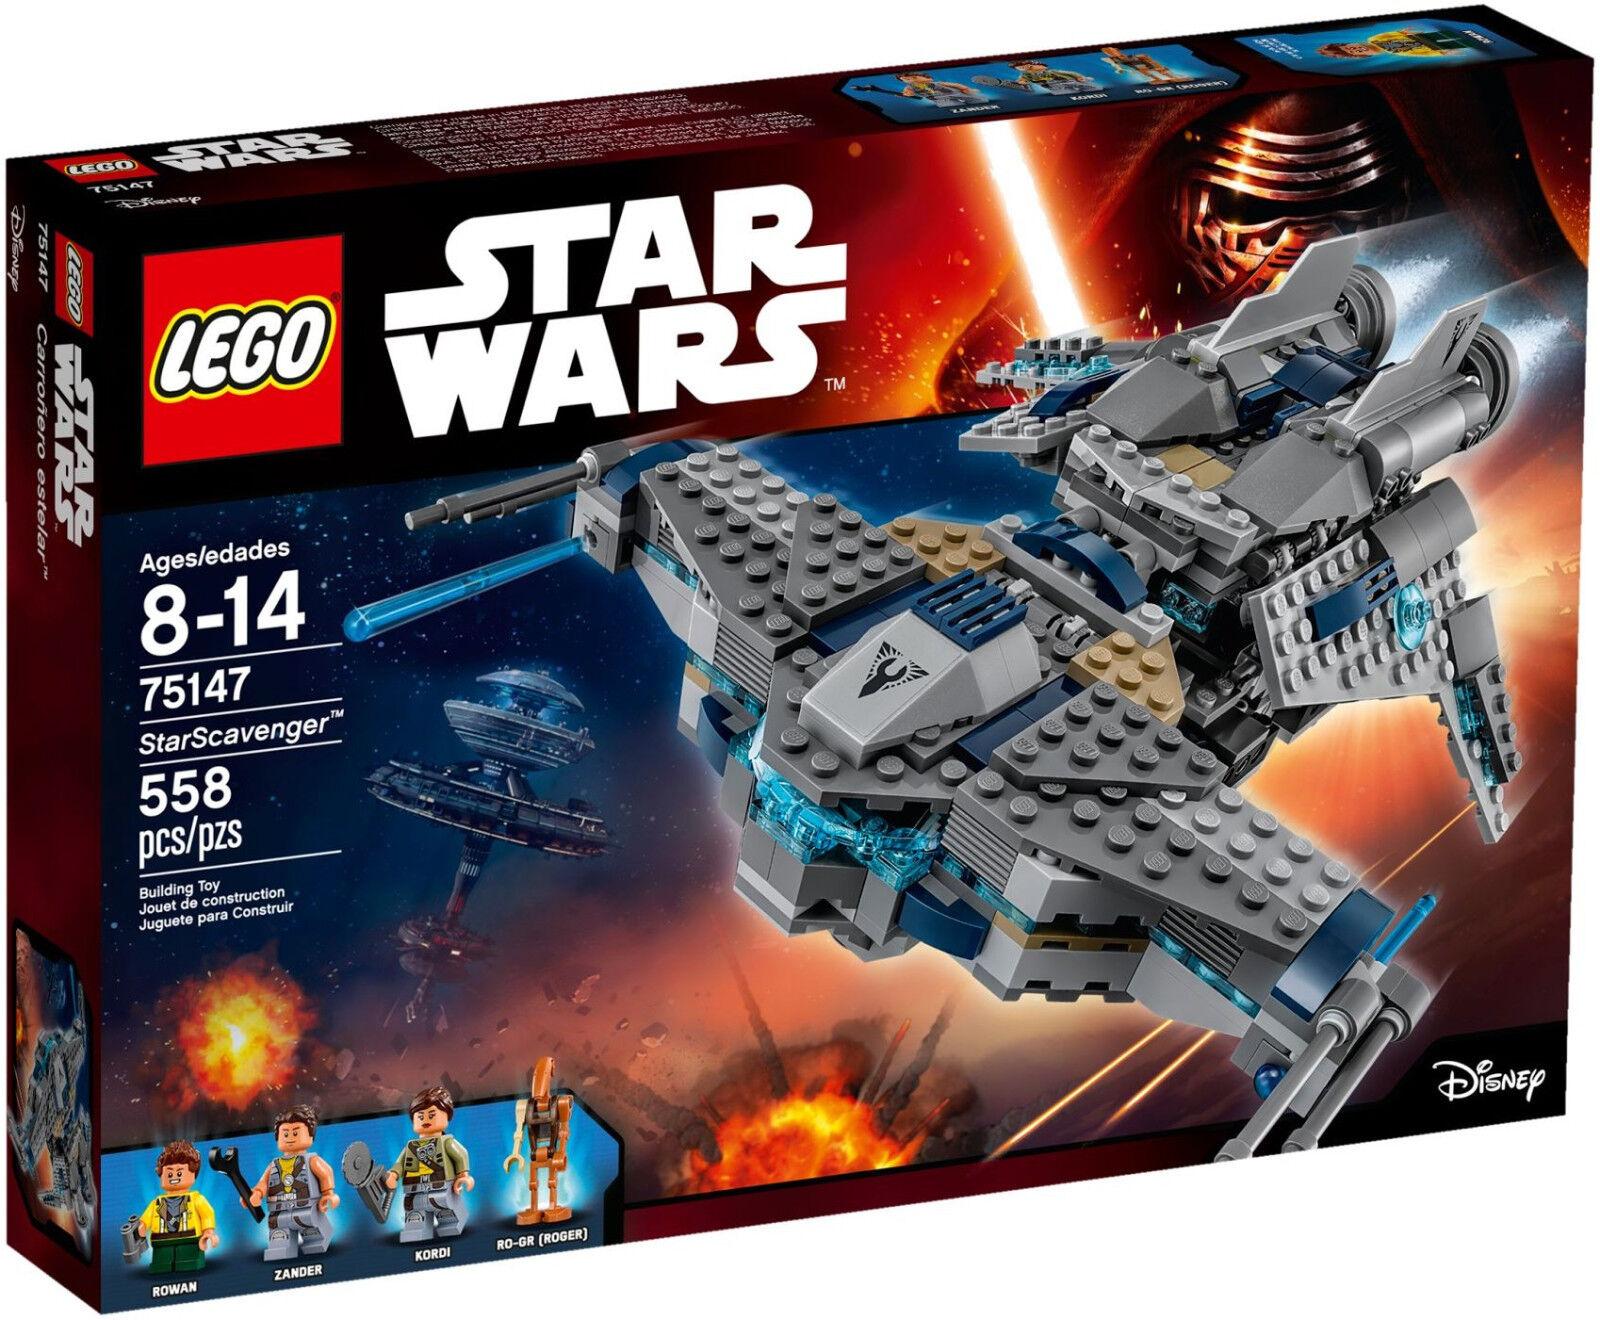 LEGO Star Wars - 75147 starscavenger con Rowan, Persico, Kordi, RO-GR-NUOVO & OVP